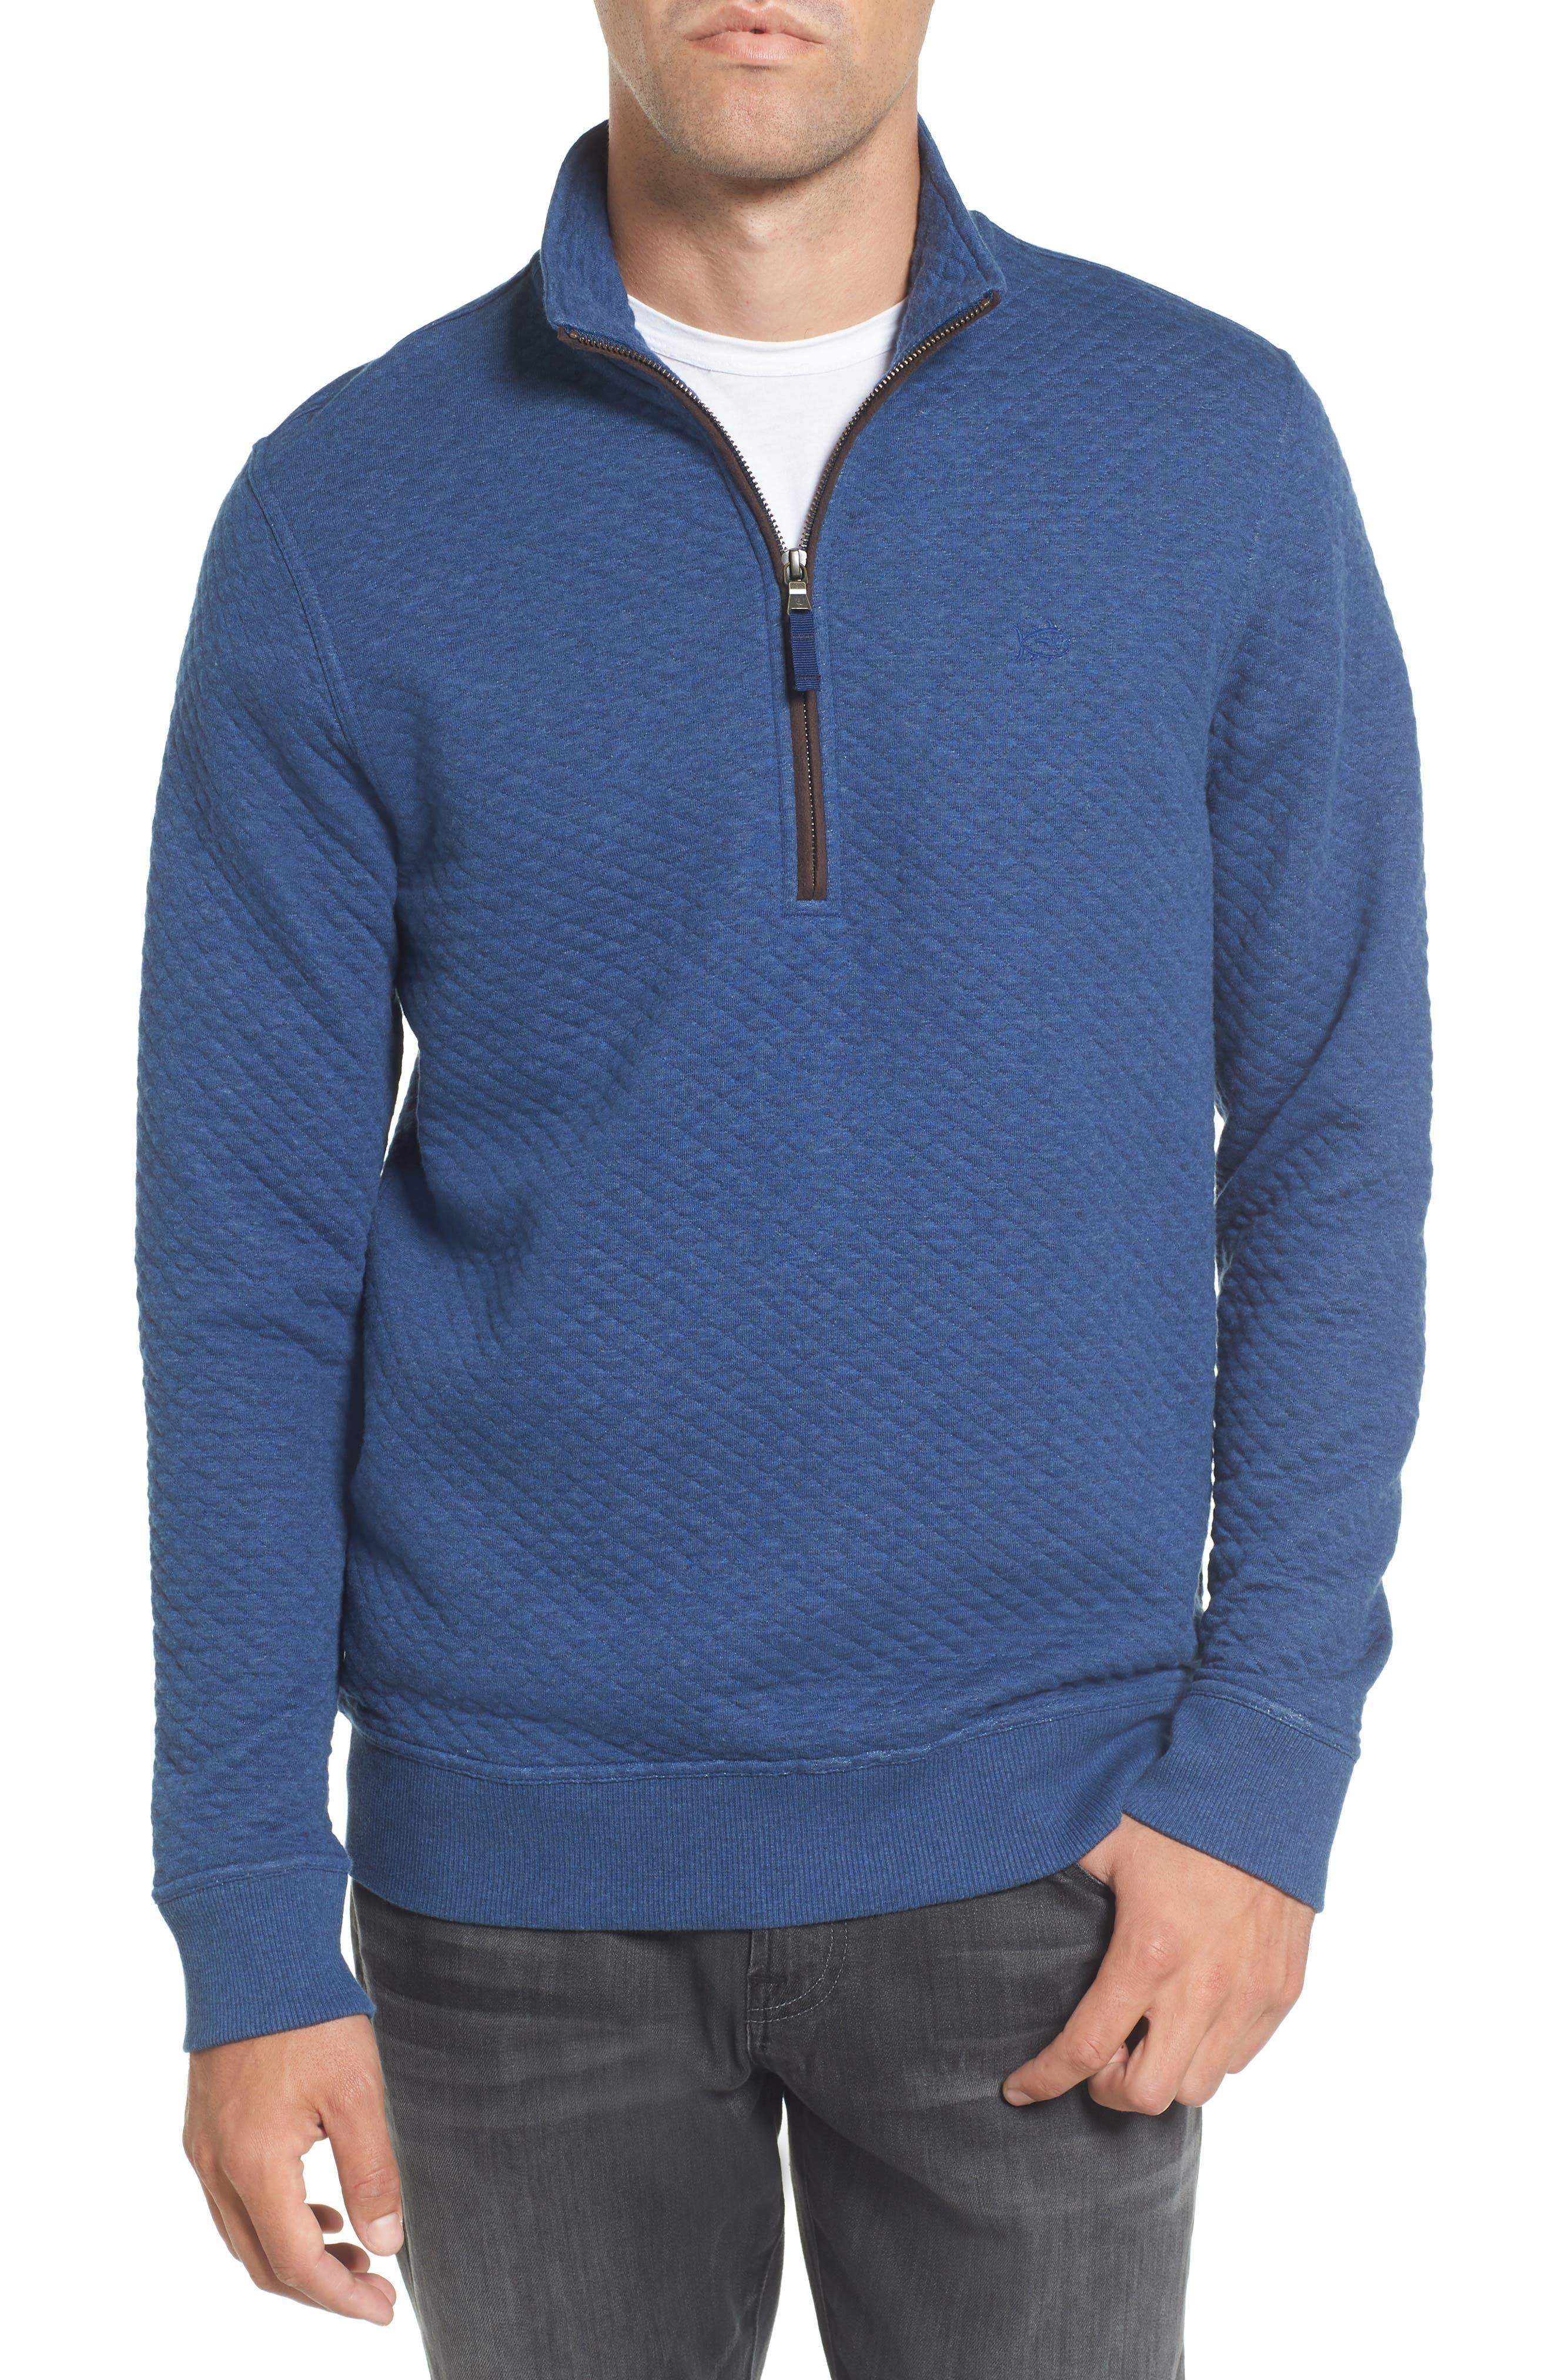 Sundown Quilted Quarter Zip Pullover,                         Main,                         color, Skipper Blue